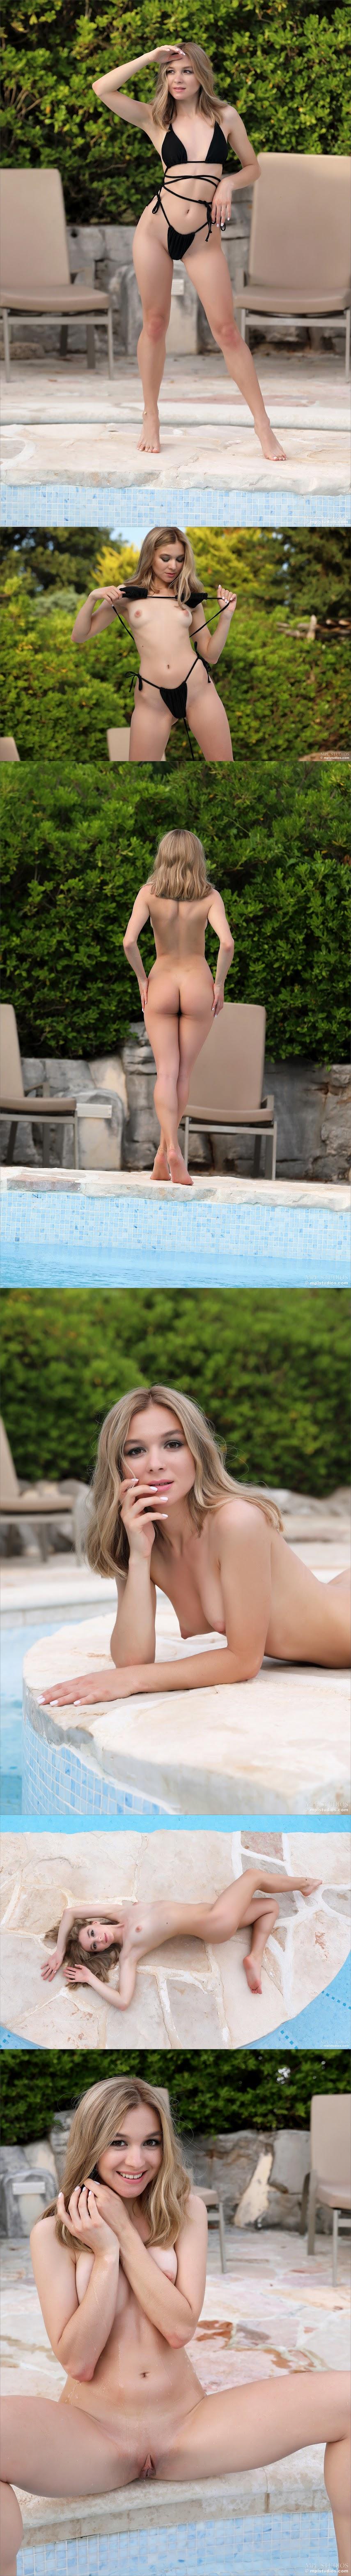 [MPLStudios] Stefani - Swimsuit Fashionista - Girlsdelta